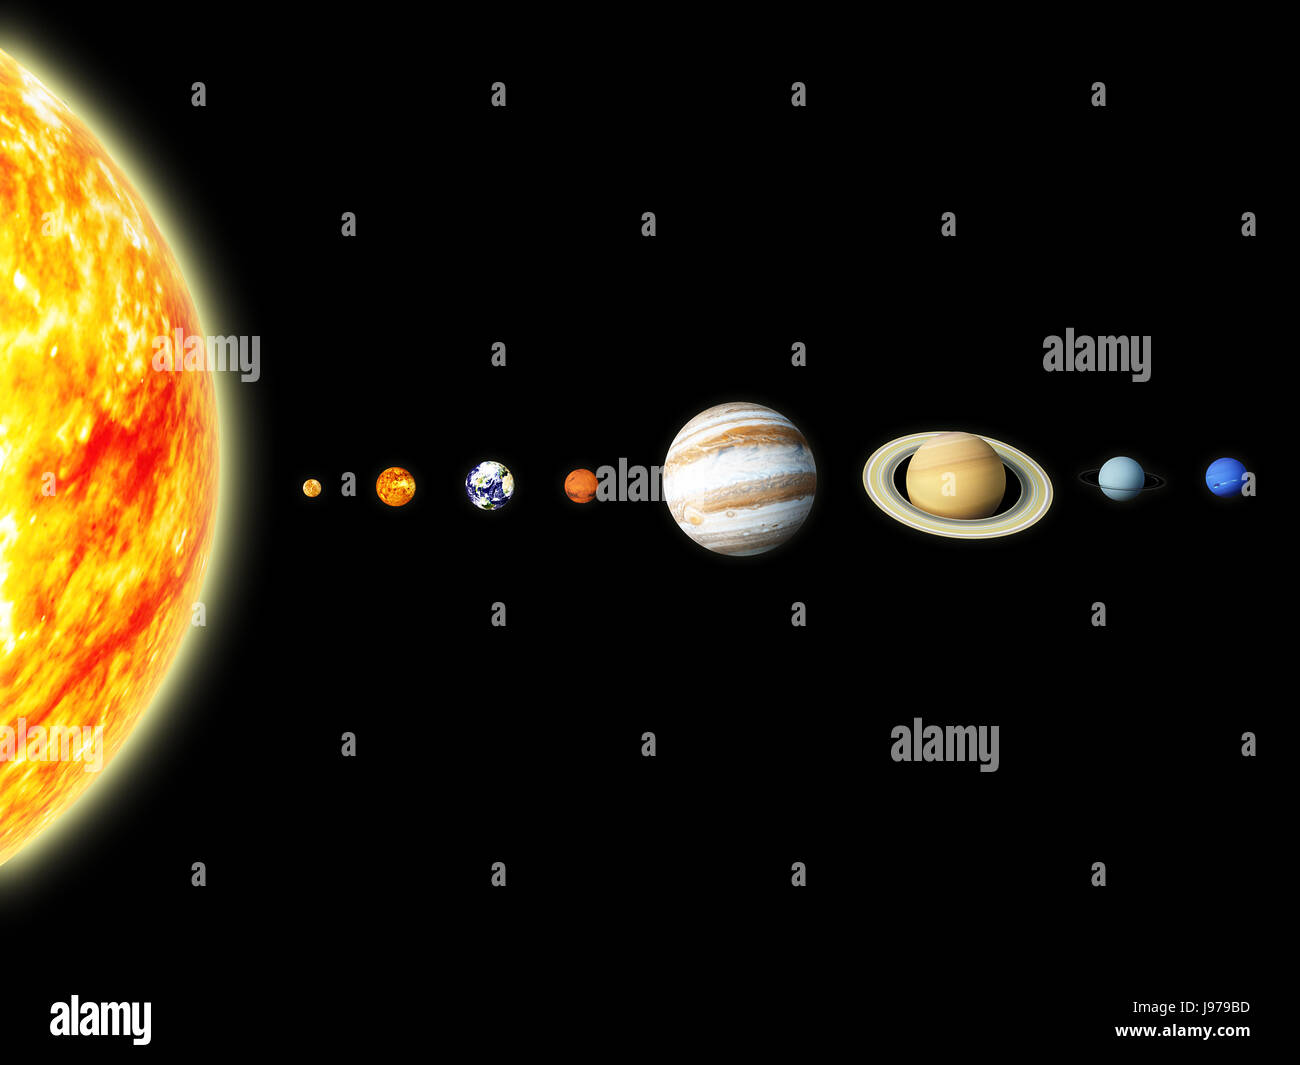 Education Science Solar System Astronomy Planetary